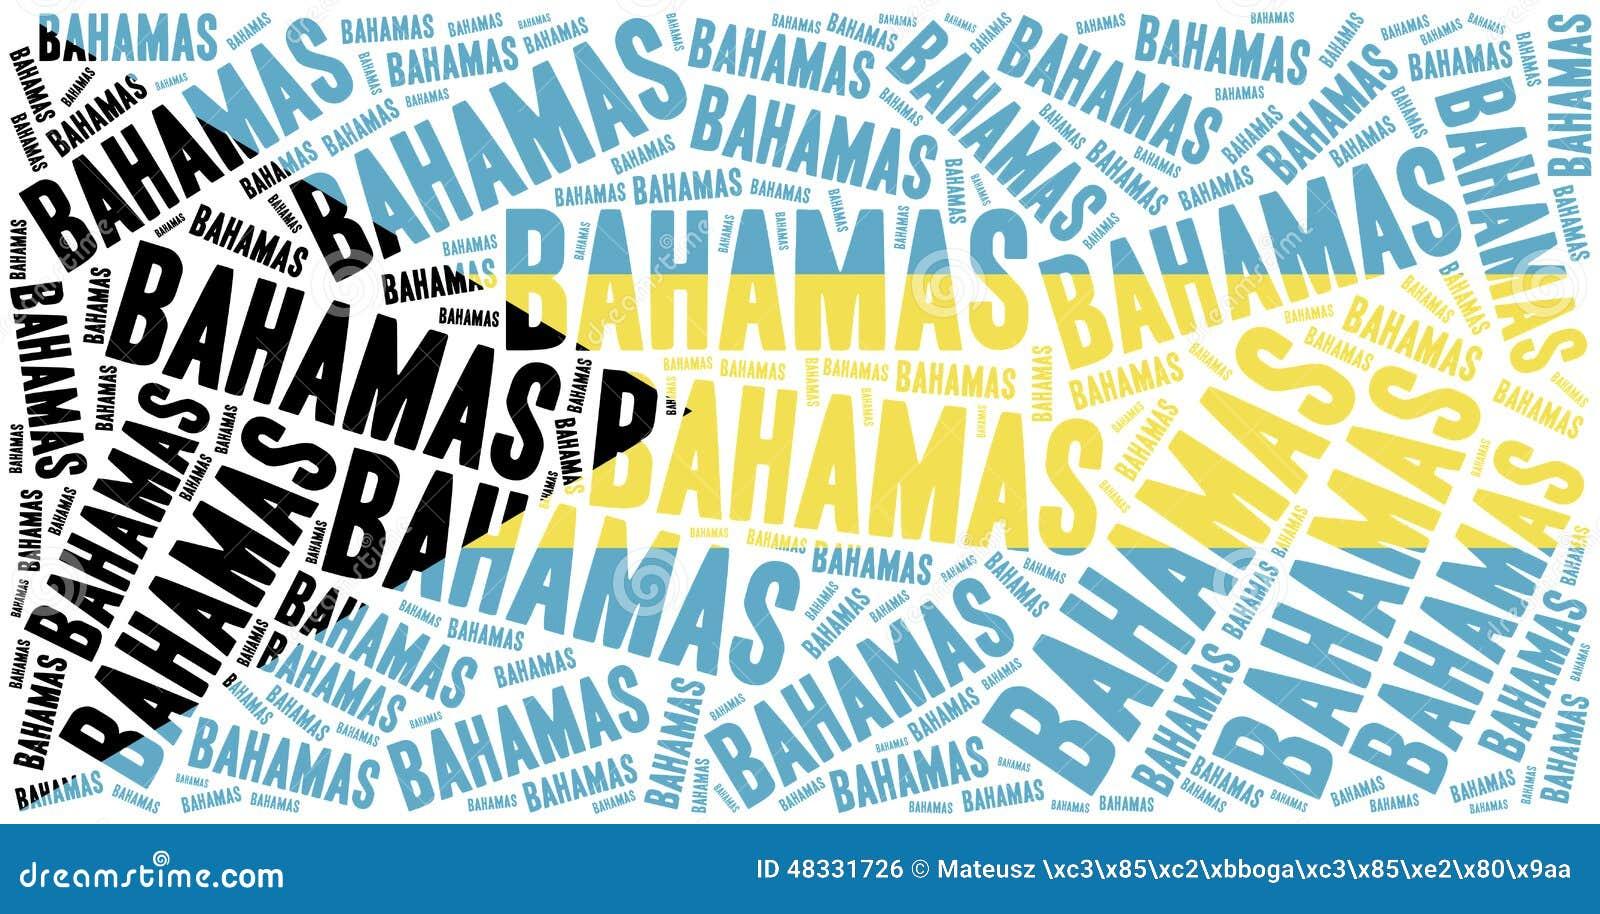 Bahamas Flag Red